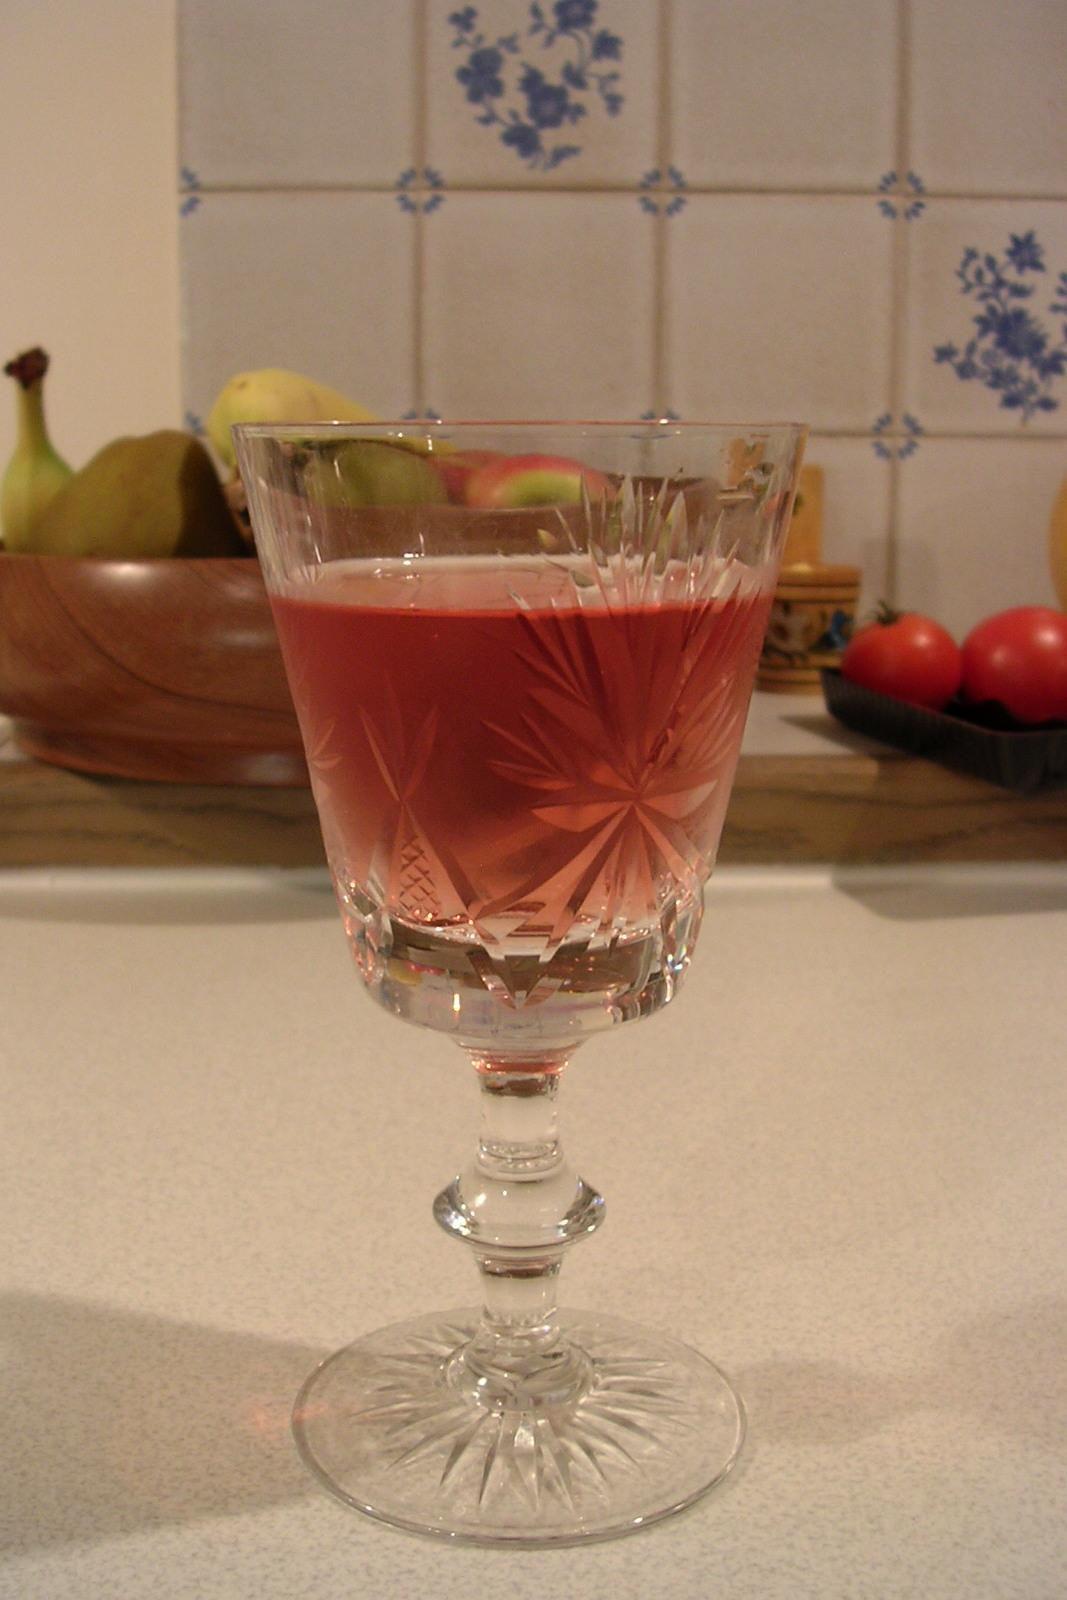 Depiction of Vino rosado